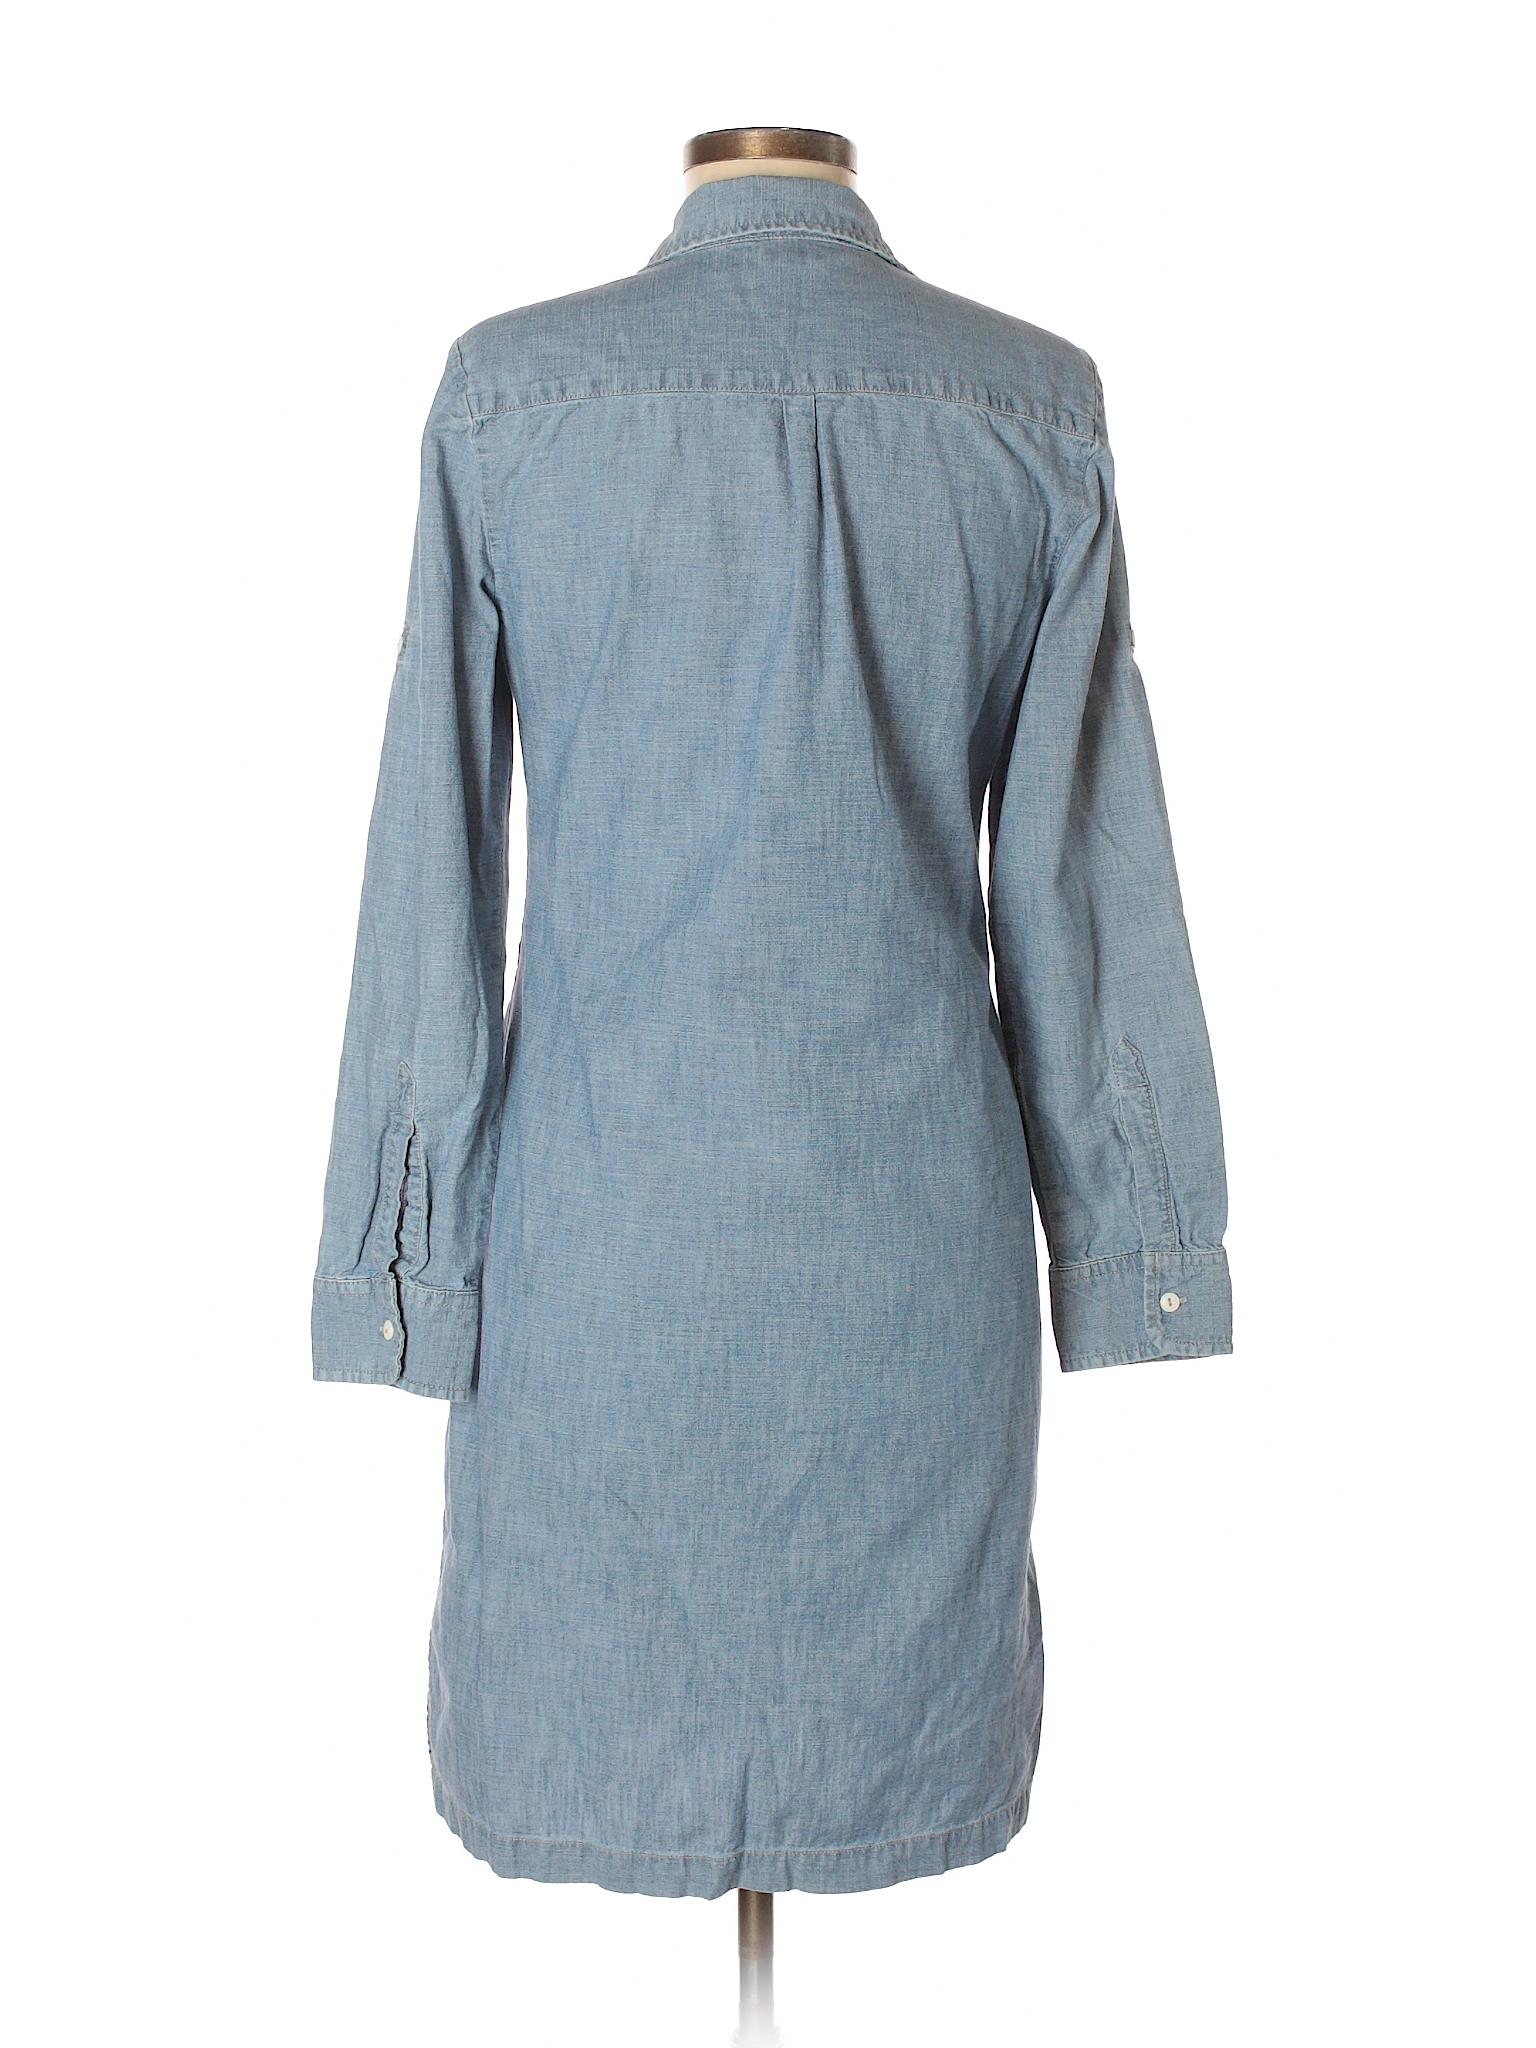 L L Boutique winter Casual Bean Dress xTwEF7Zw